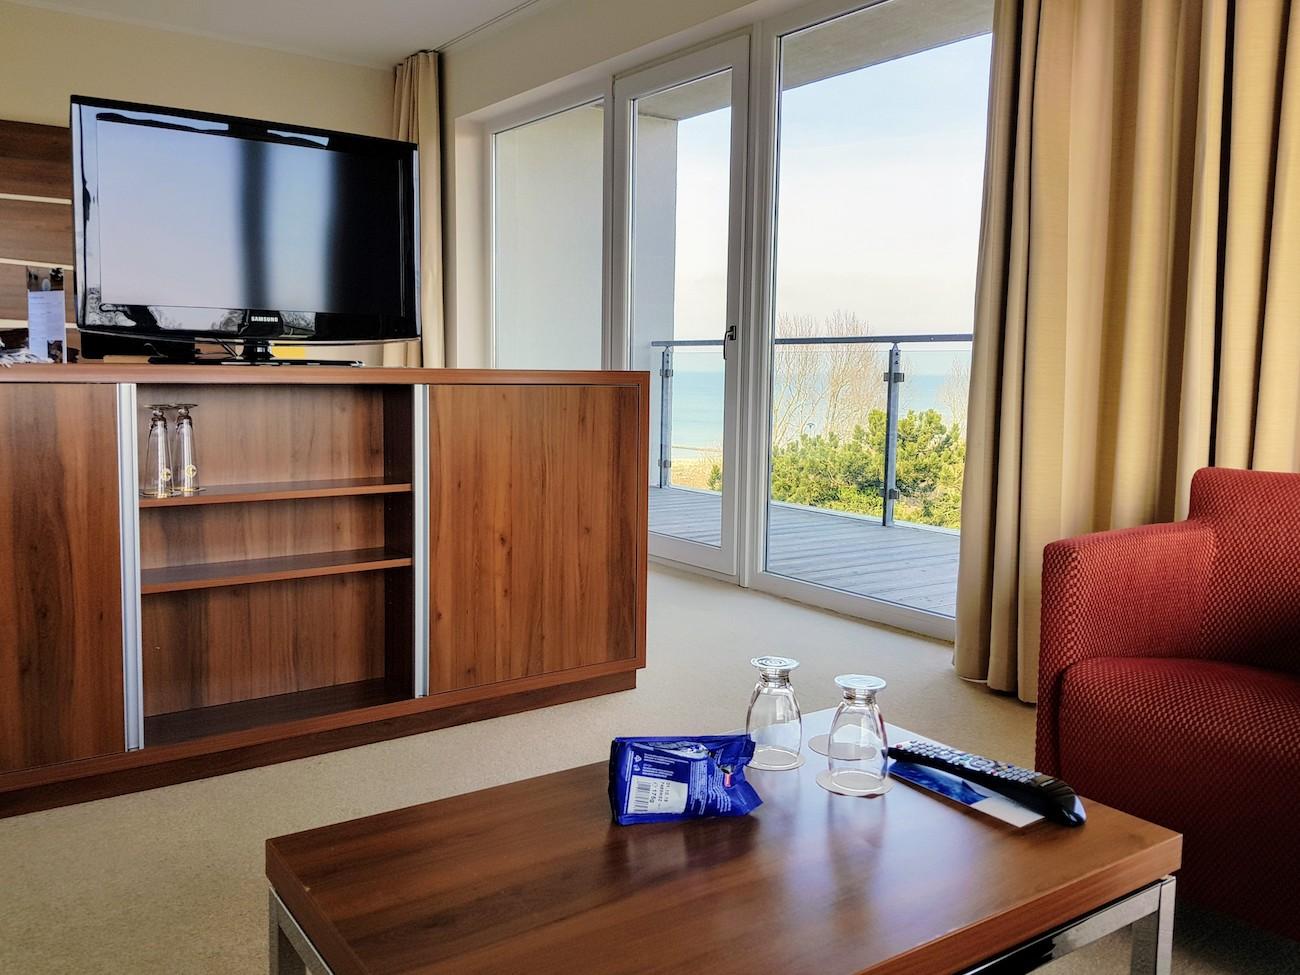 Hotelzimmer mit Meerblick im The GRAND Ahrenshoop